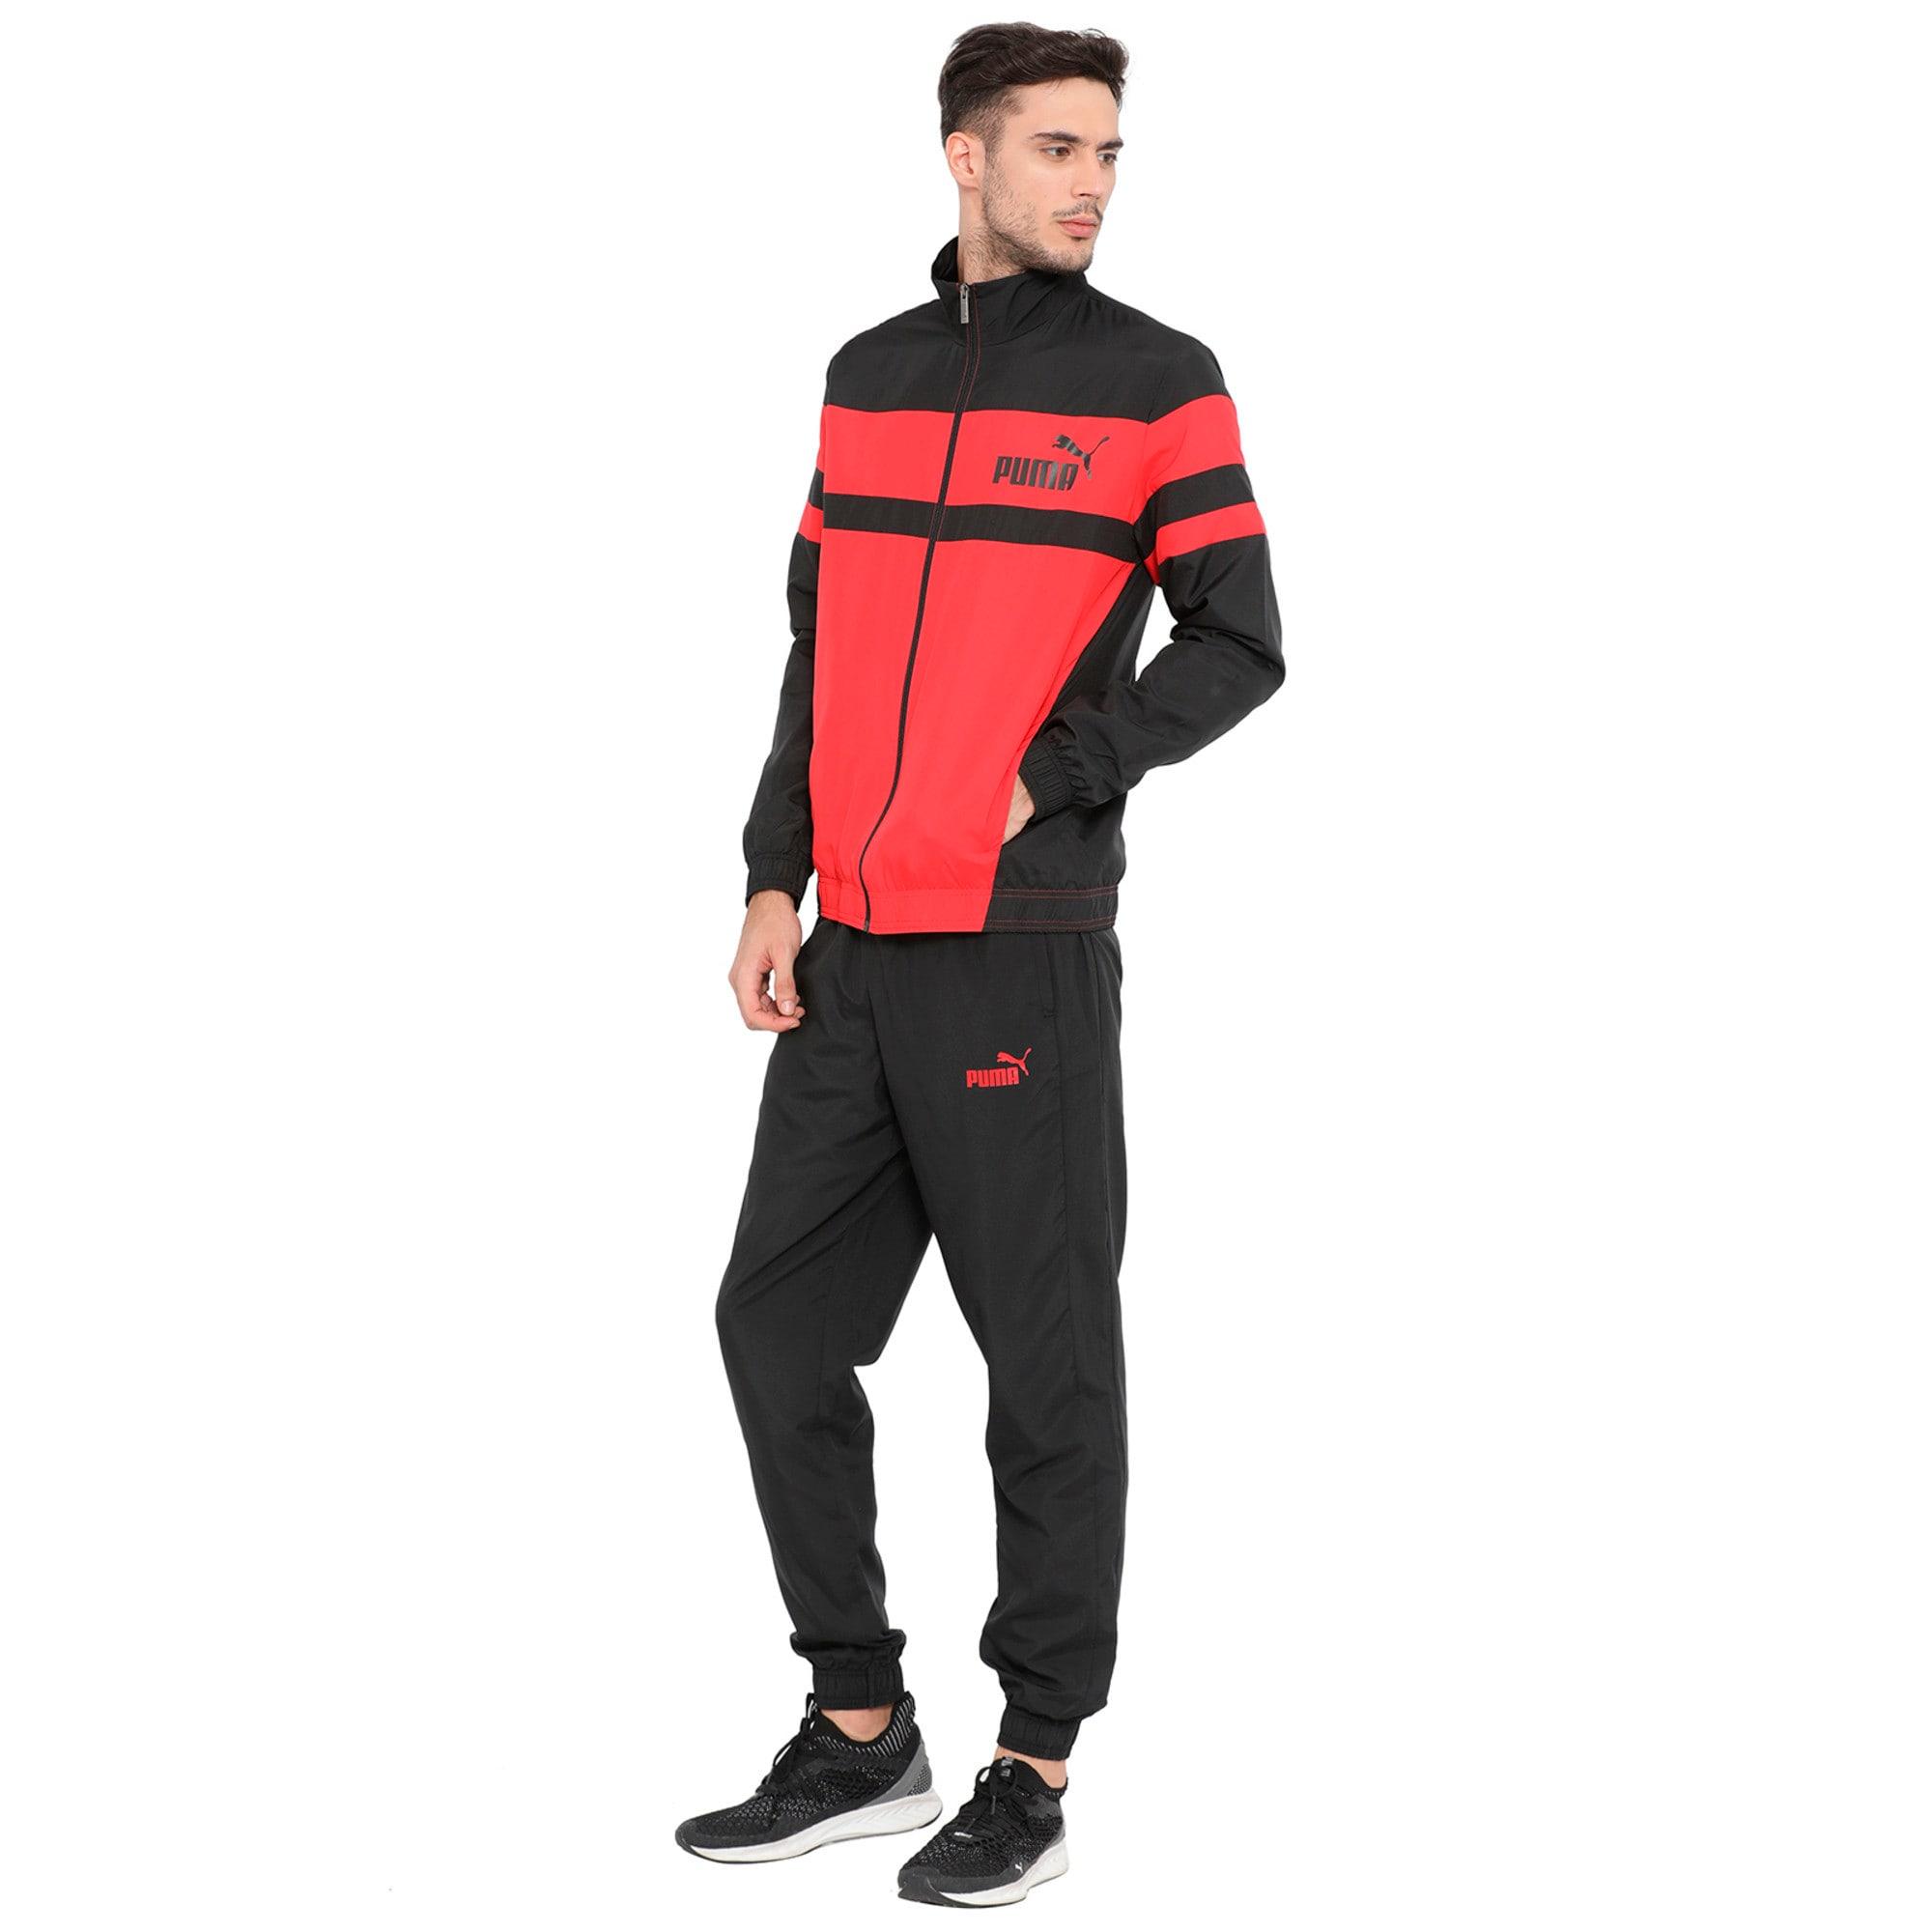 Thumbnail 5 of CB Woven Suit, Ribbon Red-Puma Black, medium-IND